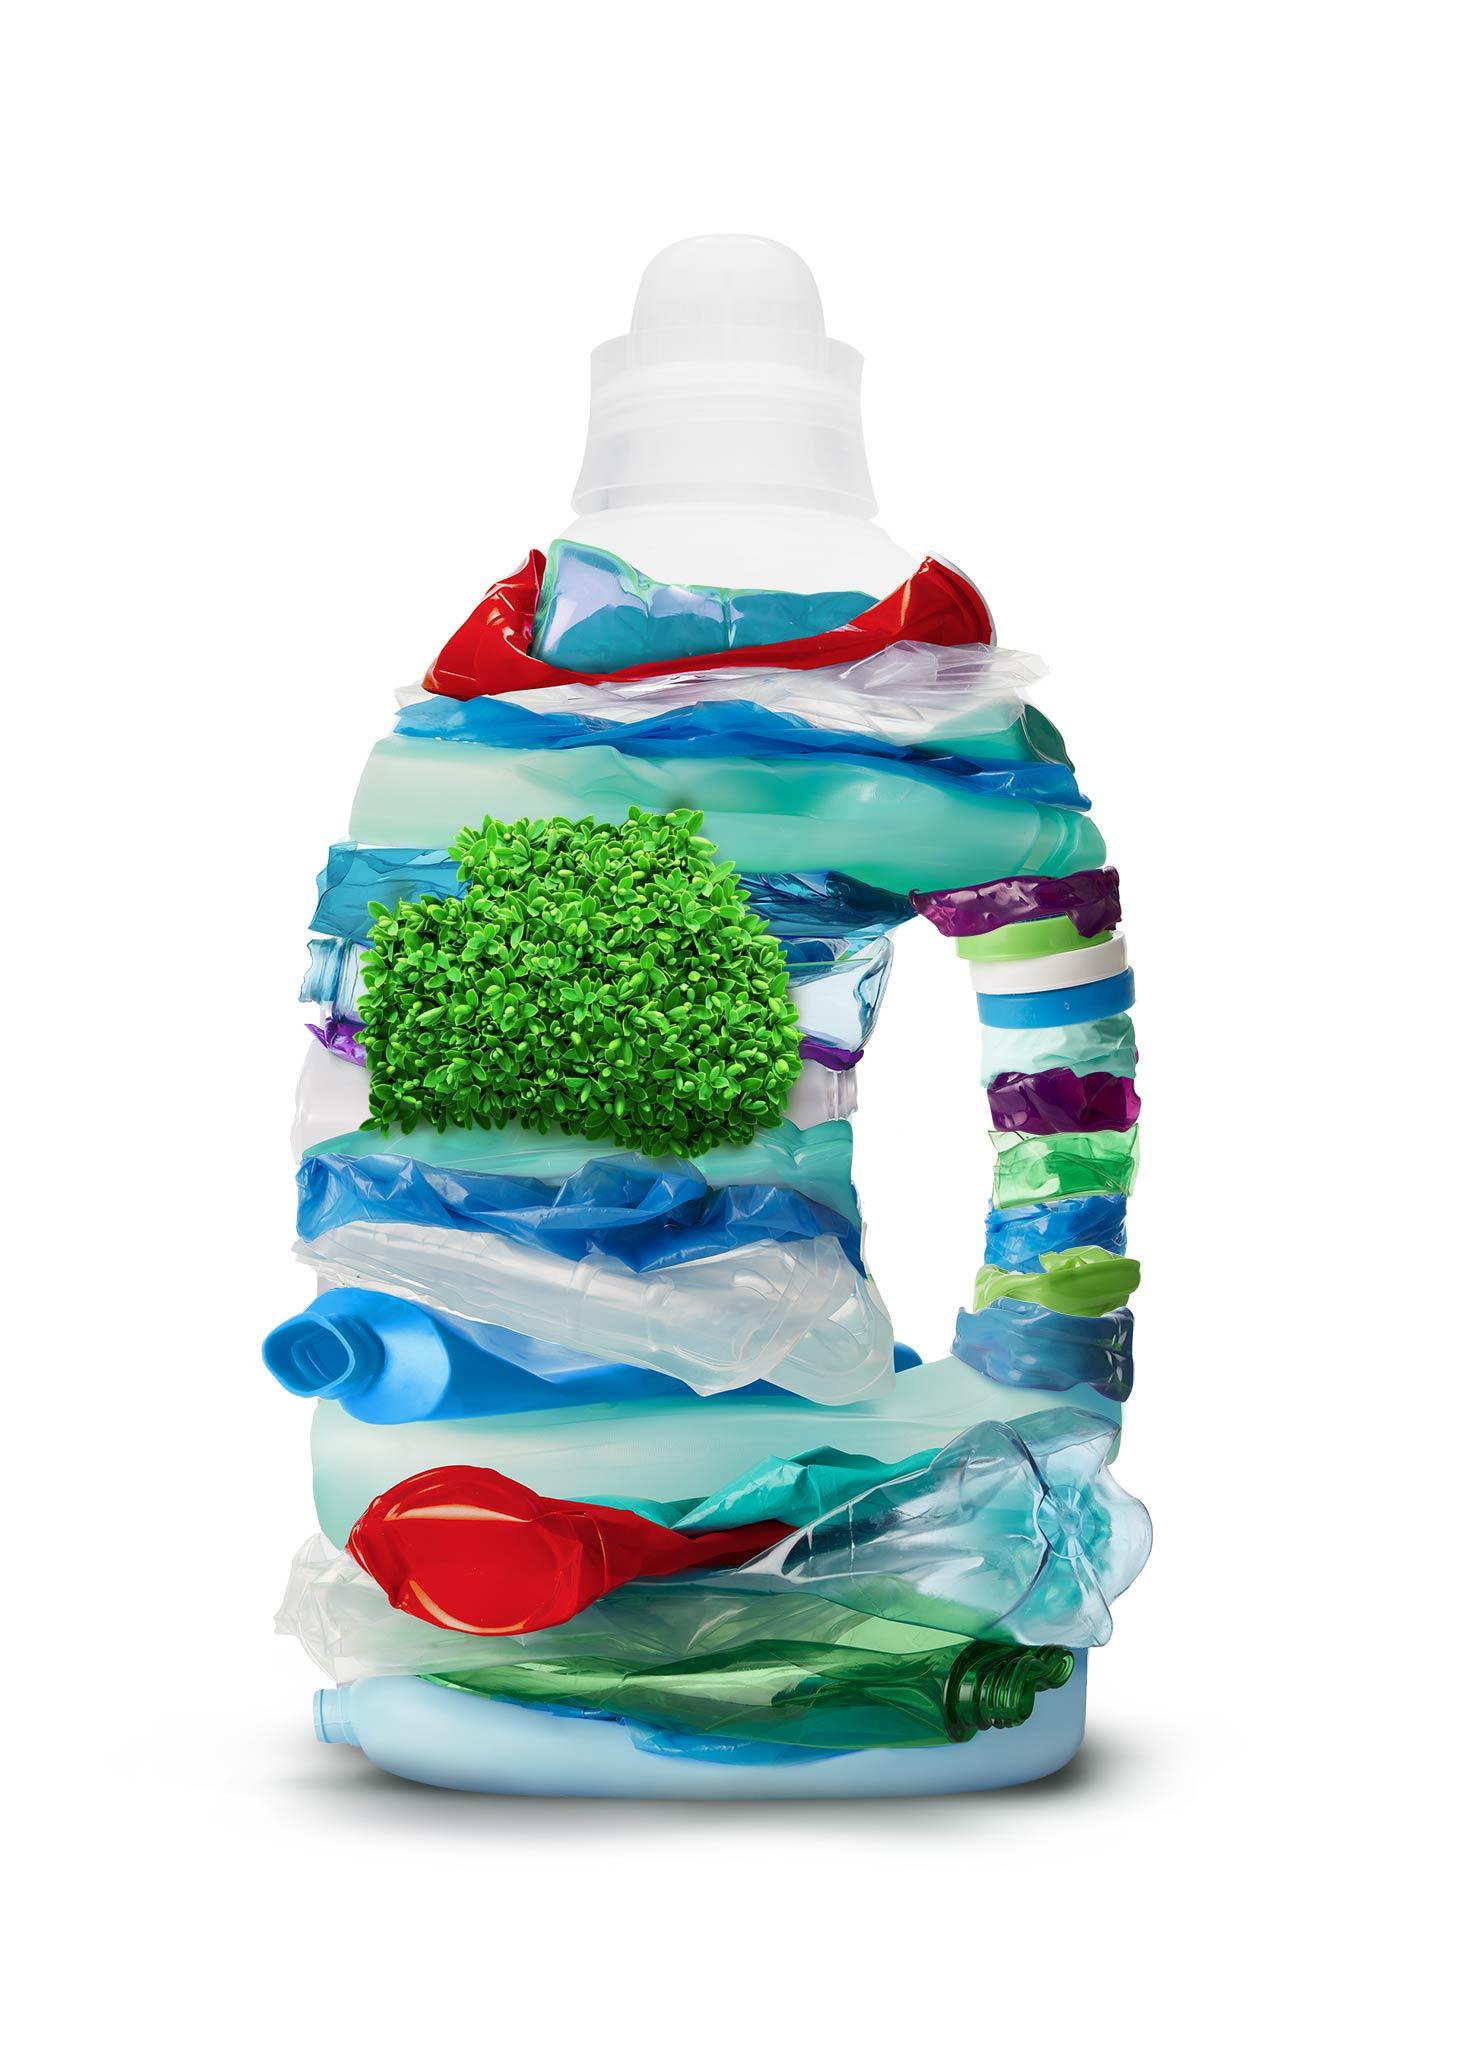 EURO-Laundry_Recycling_08.jpg